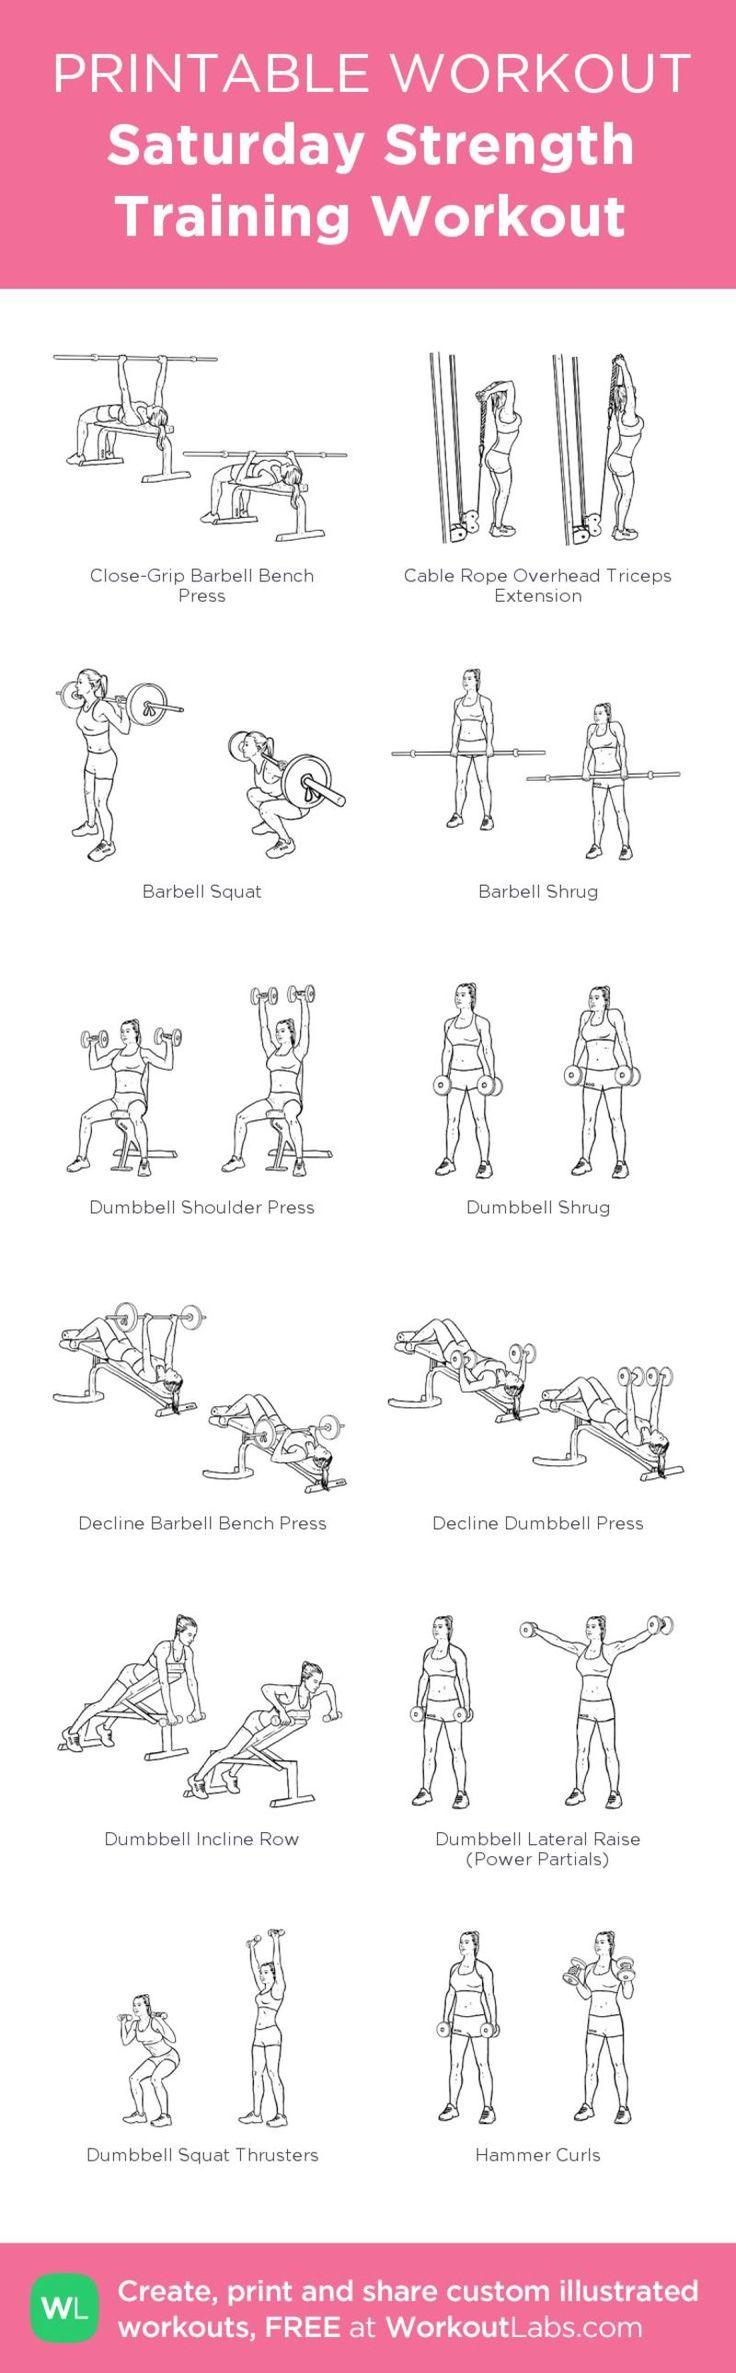 Saturday Strength Training Workout: my custom printable workout by @WorkoutLabs #workoutlabs #customworkout